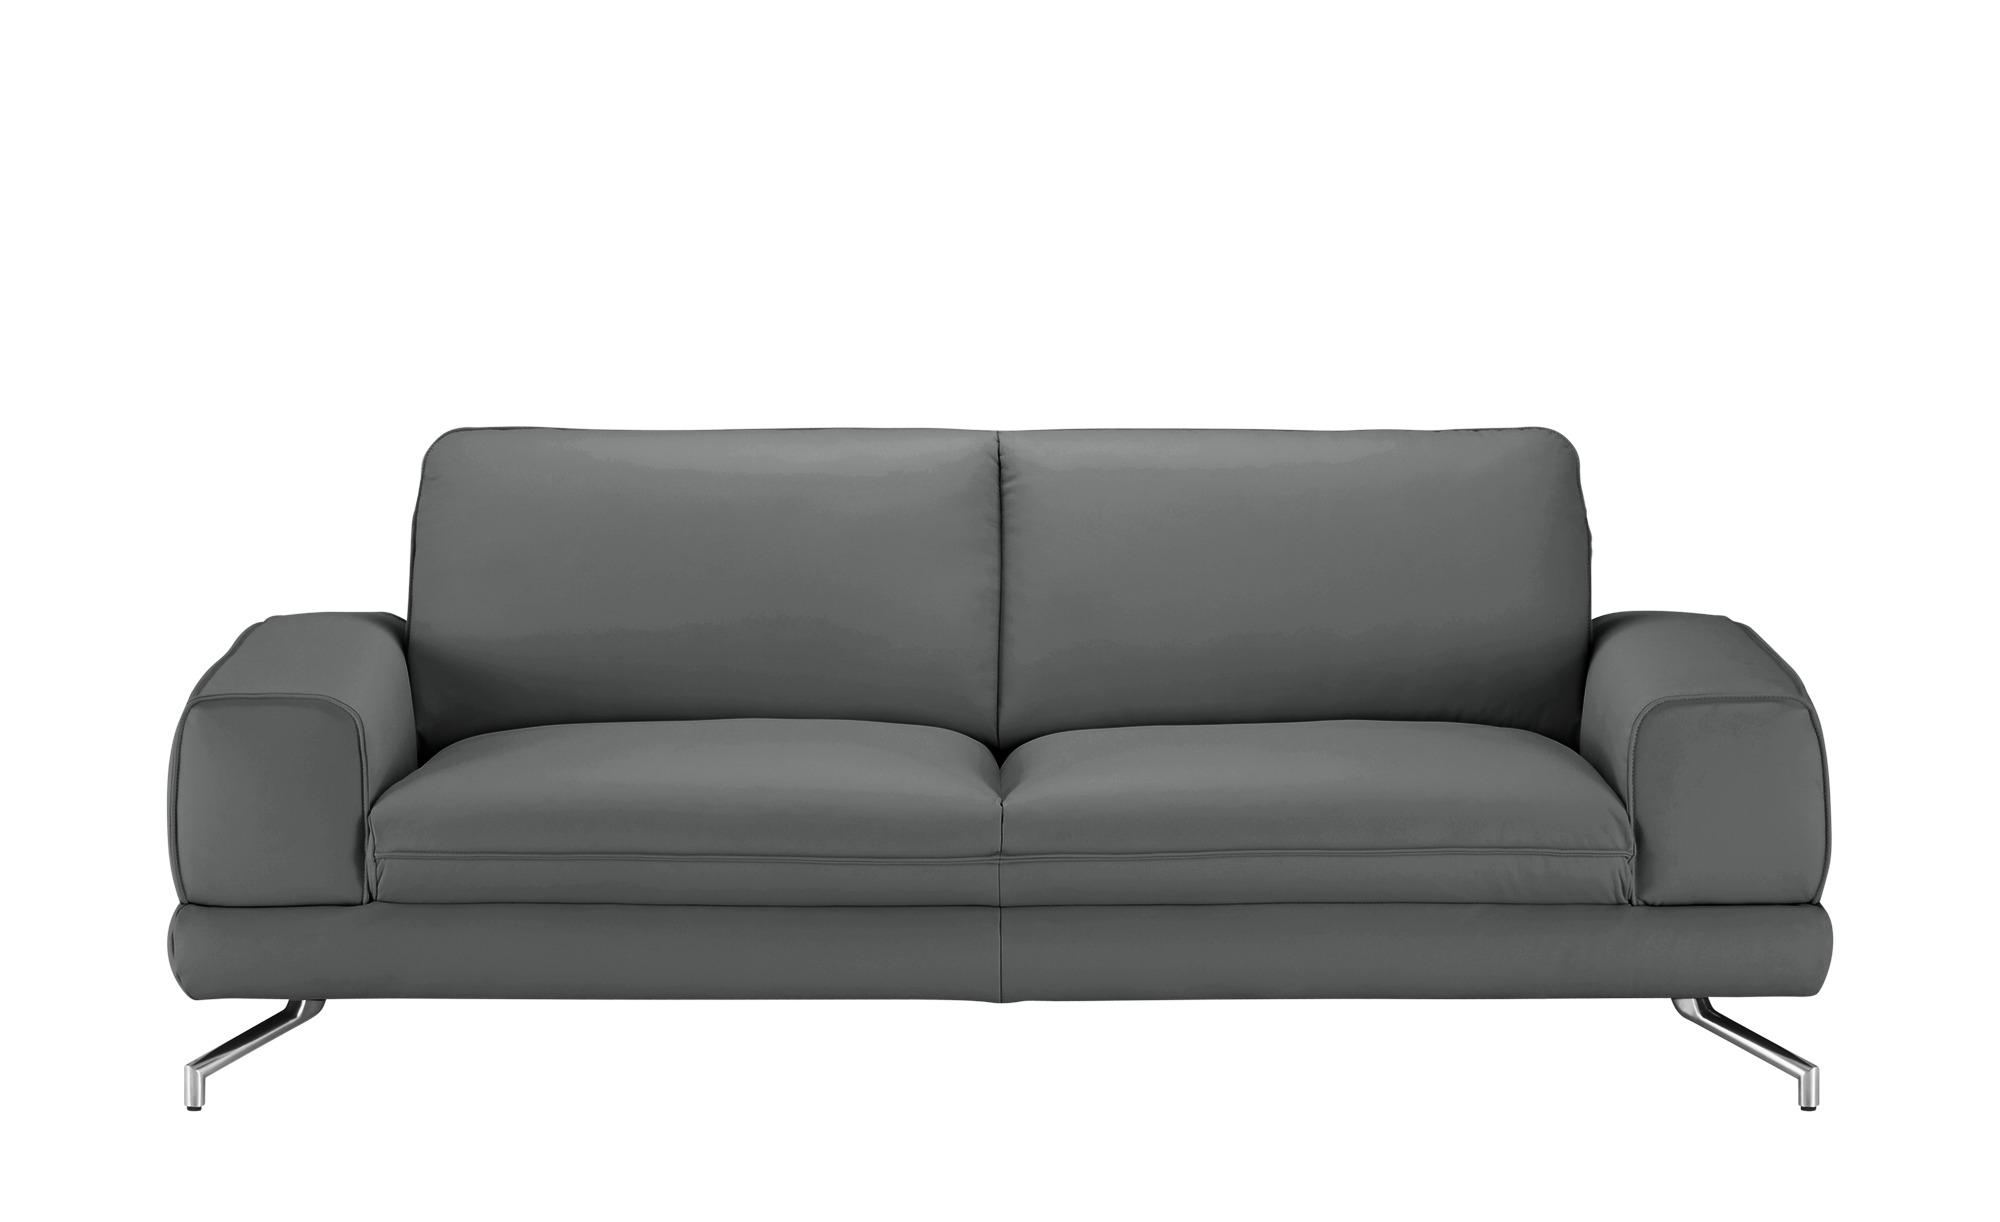 smart Sofa  Bonika ¦ grau ¦ Maße (cm): B: 218 H: 83 T: 95 Polstermöbel > Sofas > 3-Sitzer - Höffner